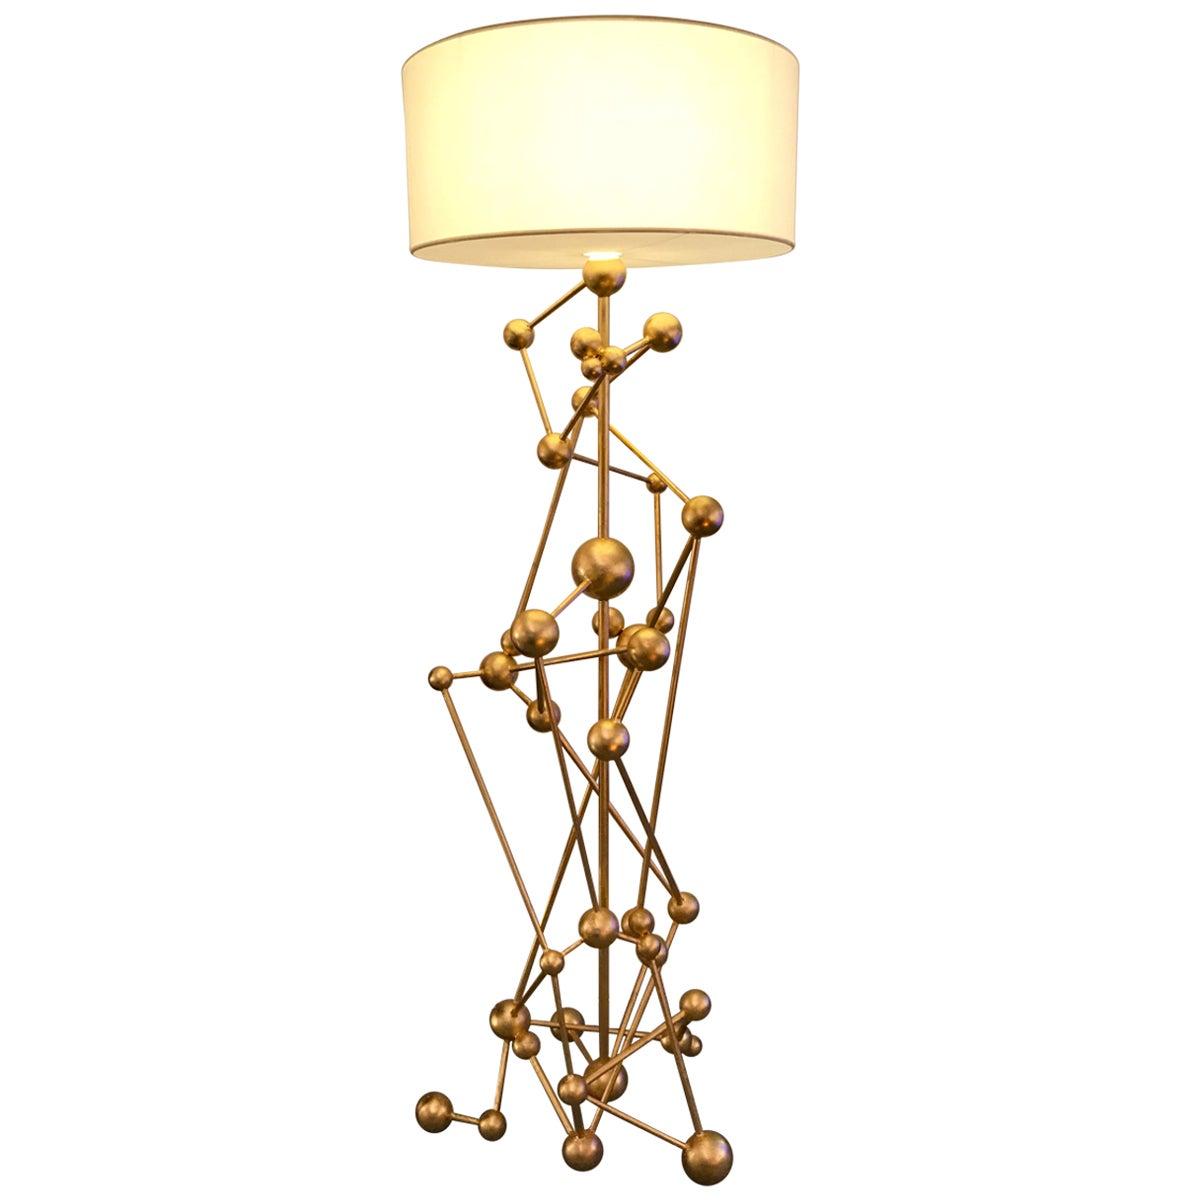 Floor Lamp Atomica Iron Gold Leaf by Antonio Cagianelli, Italy, 2018